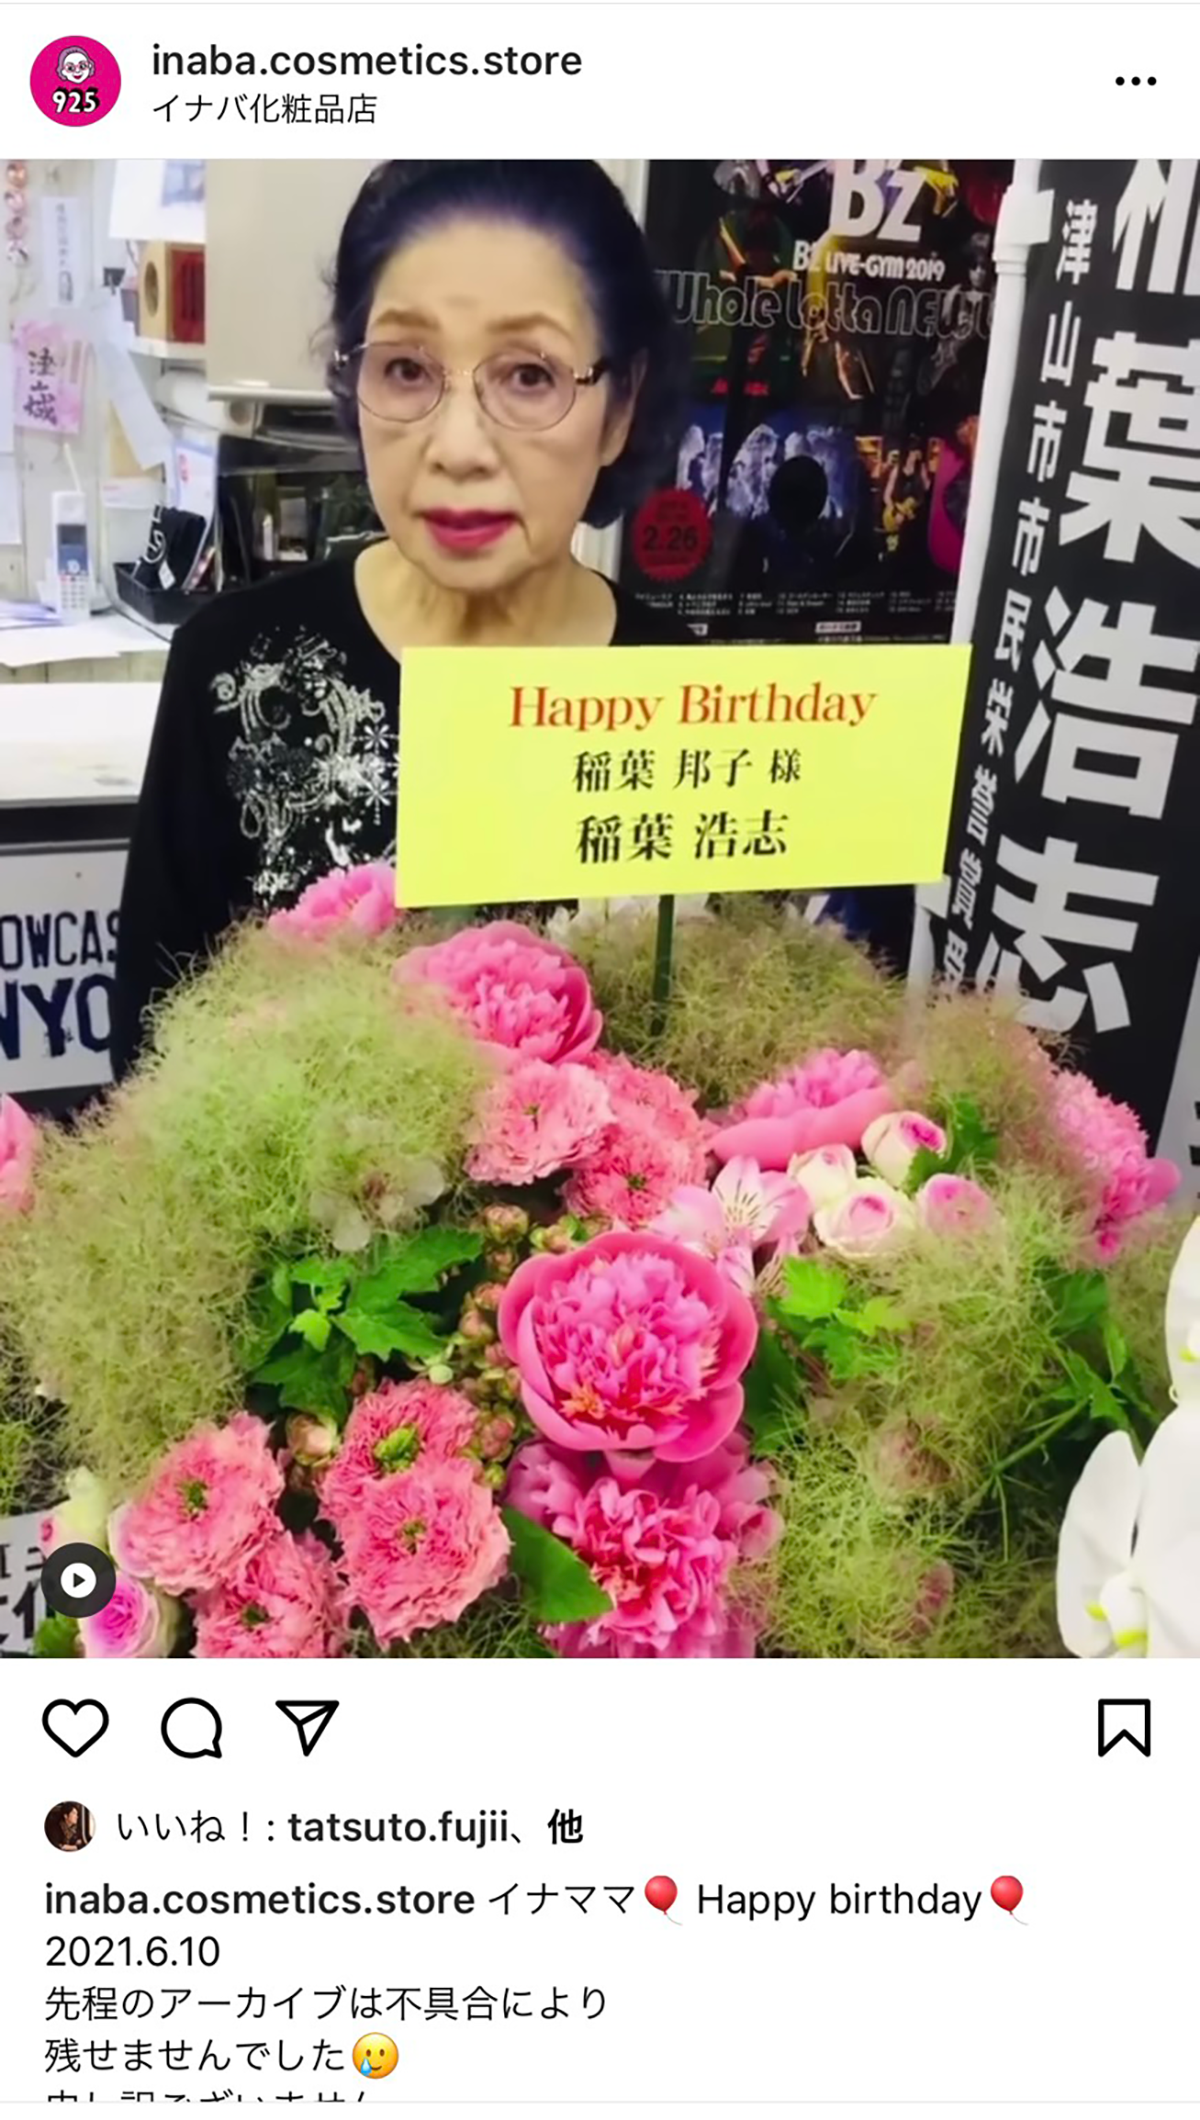 B'z稲葉浩志の母・邦子さんがお誕生日を迎えた日に行われたインスタライブ